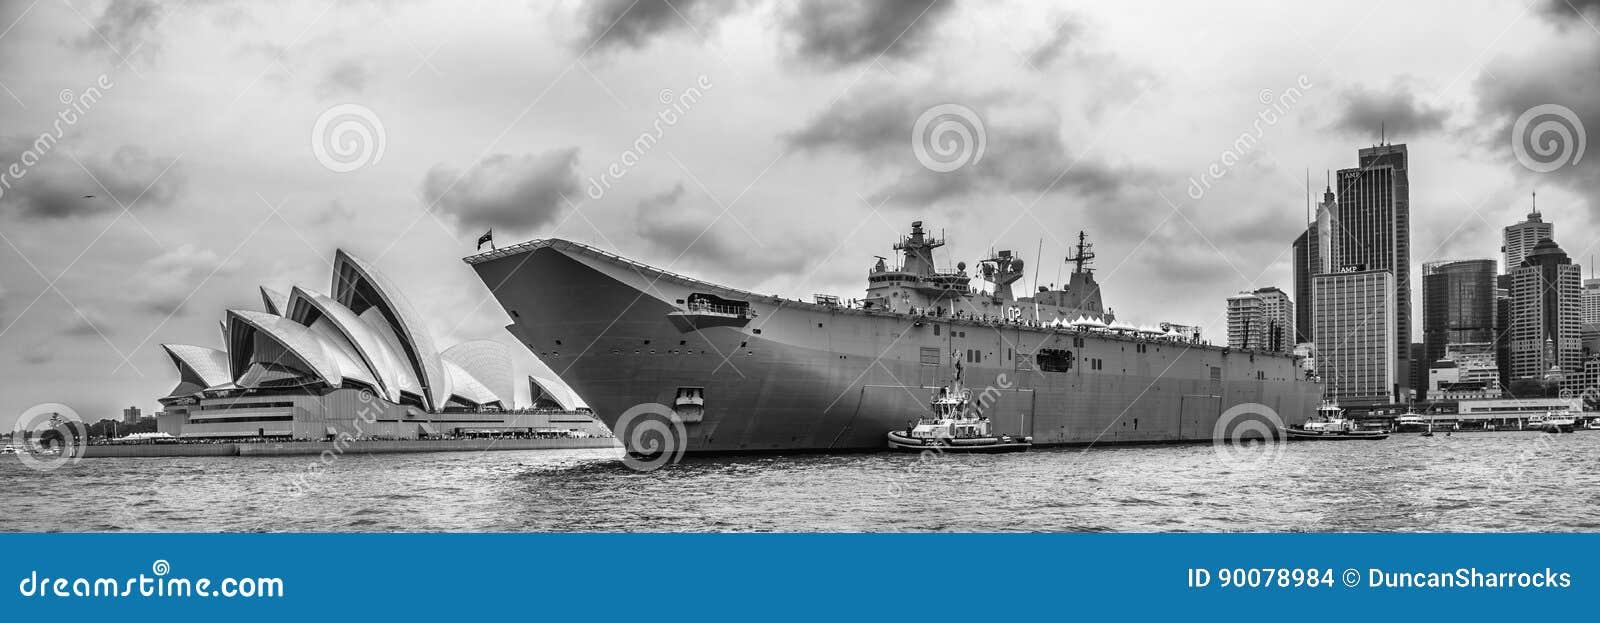 HMAS Canberra, Sydney Cove, Australië Dag 2017